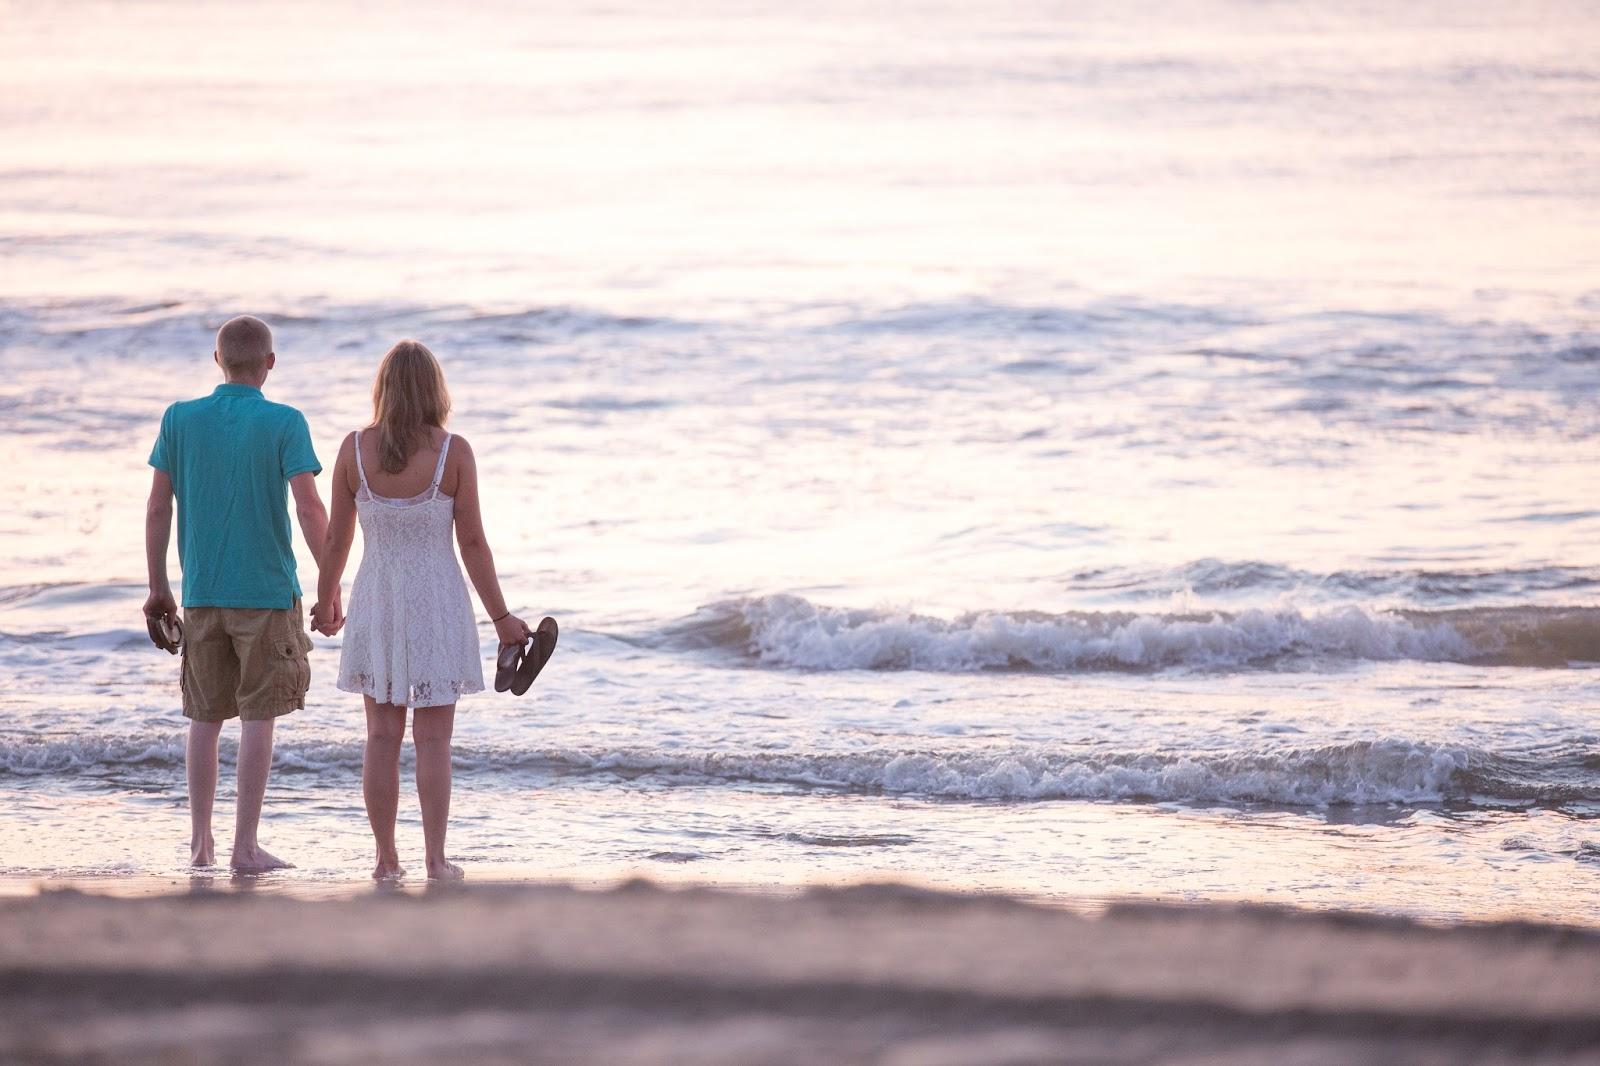 Ocean City Md Surprise Beach Wedding Proposal Engagement Photos Dana Marie Photography Photographer